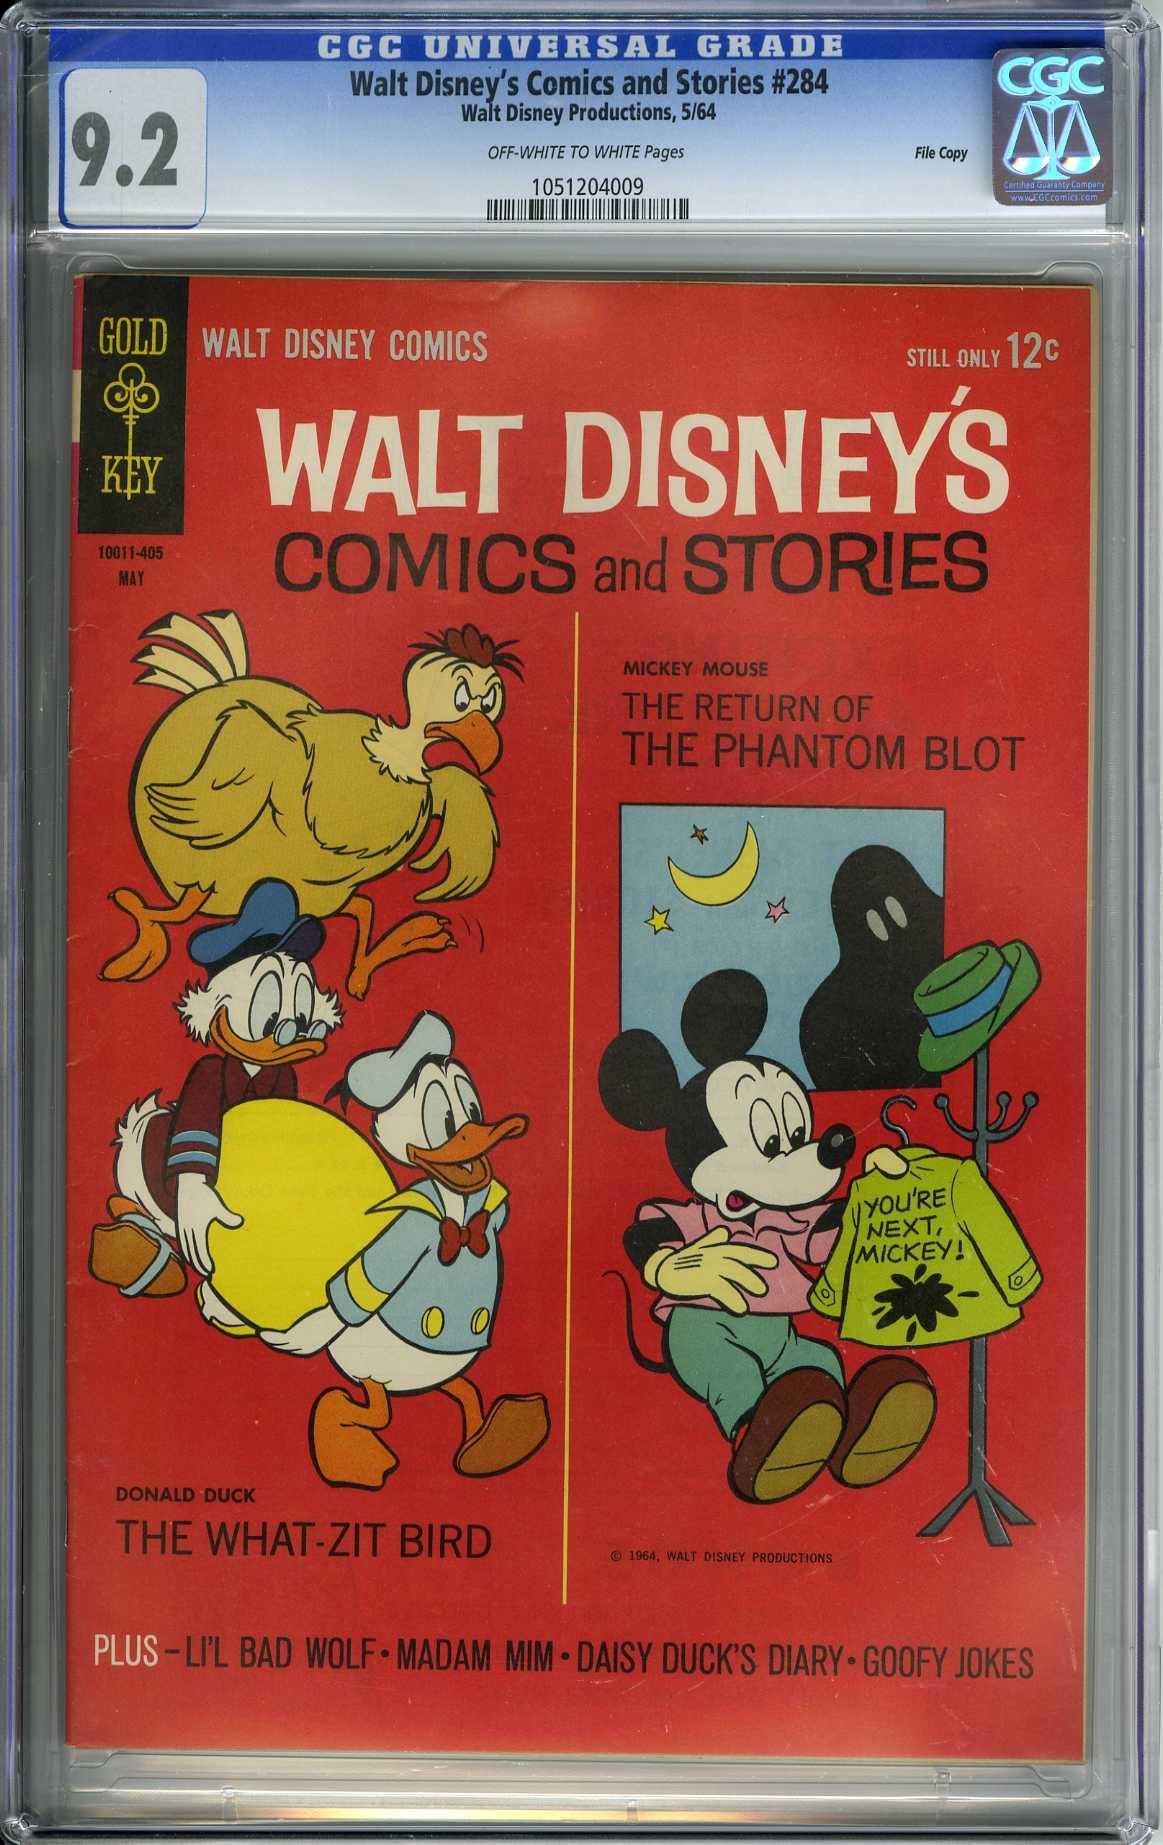 WALT DISNEY'S COMICS AND STORIES #284 1964 CGC NM- 9.2 ONLY GRADED! PHANTOM BLOT